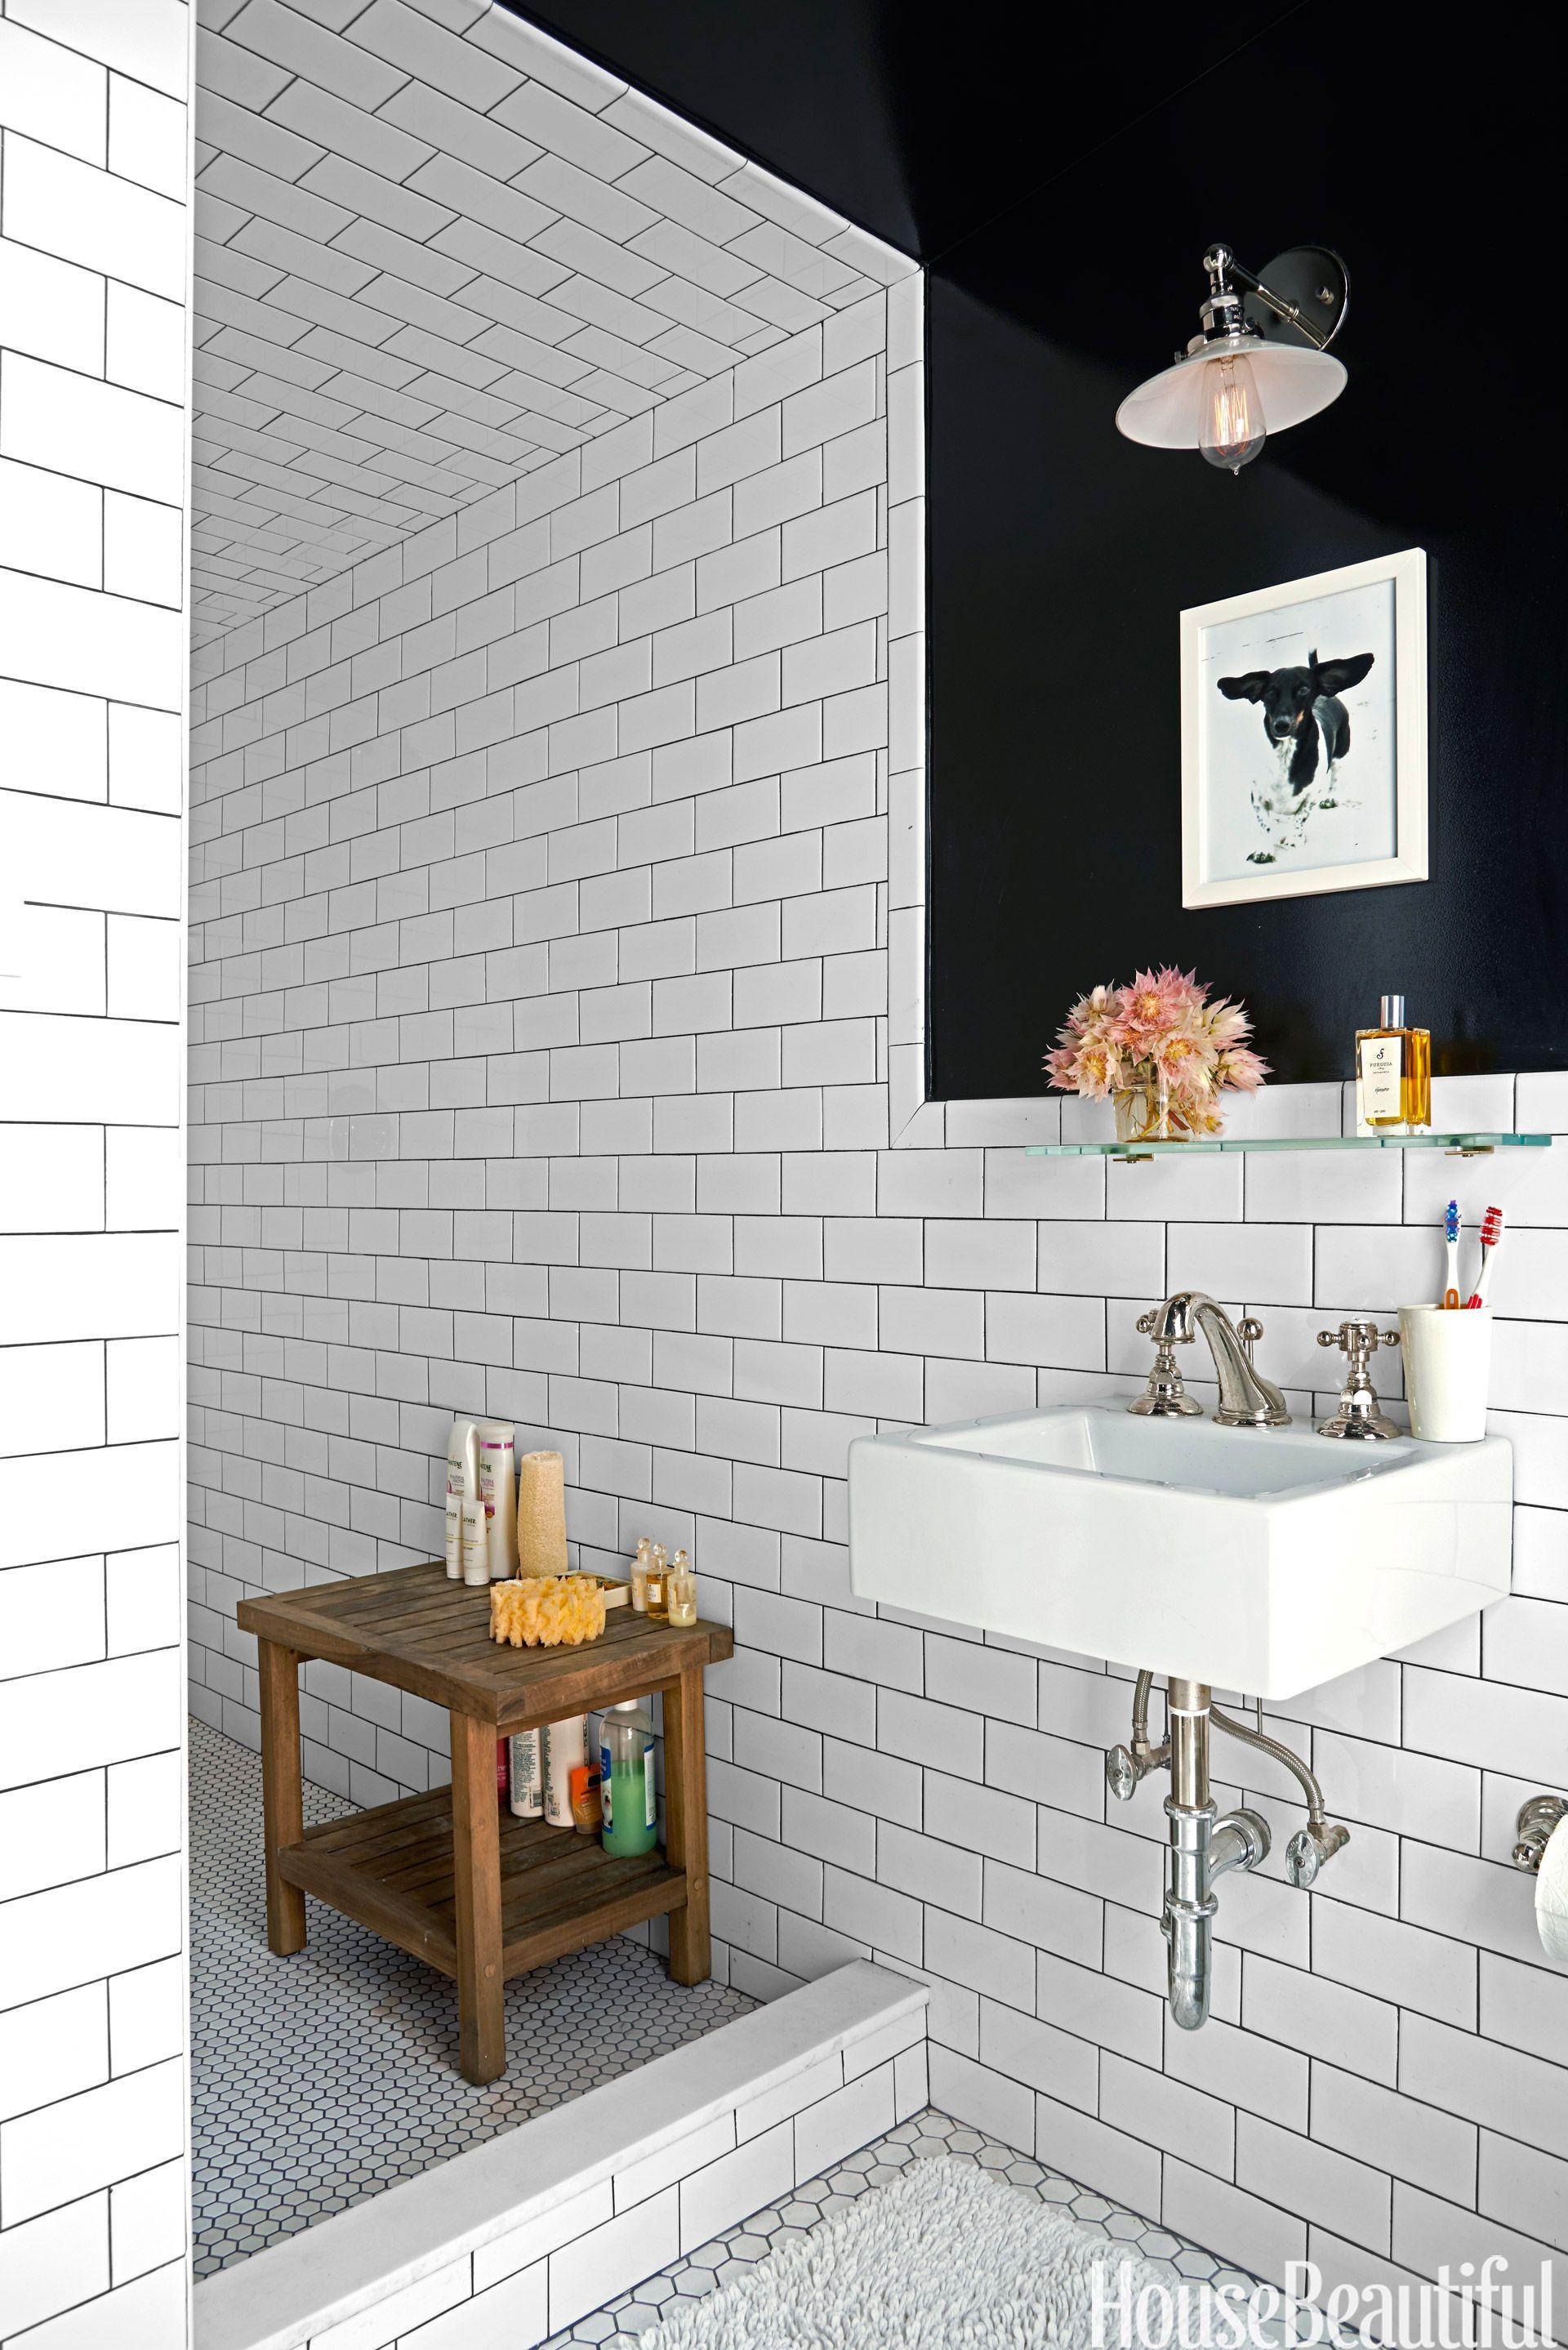 10 Best Subway Tile Bathroom Designs in 2018 - Subway Tile ... on Bathroom Ideas Subway Tile  id=27808